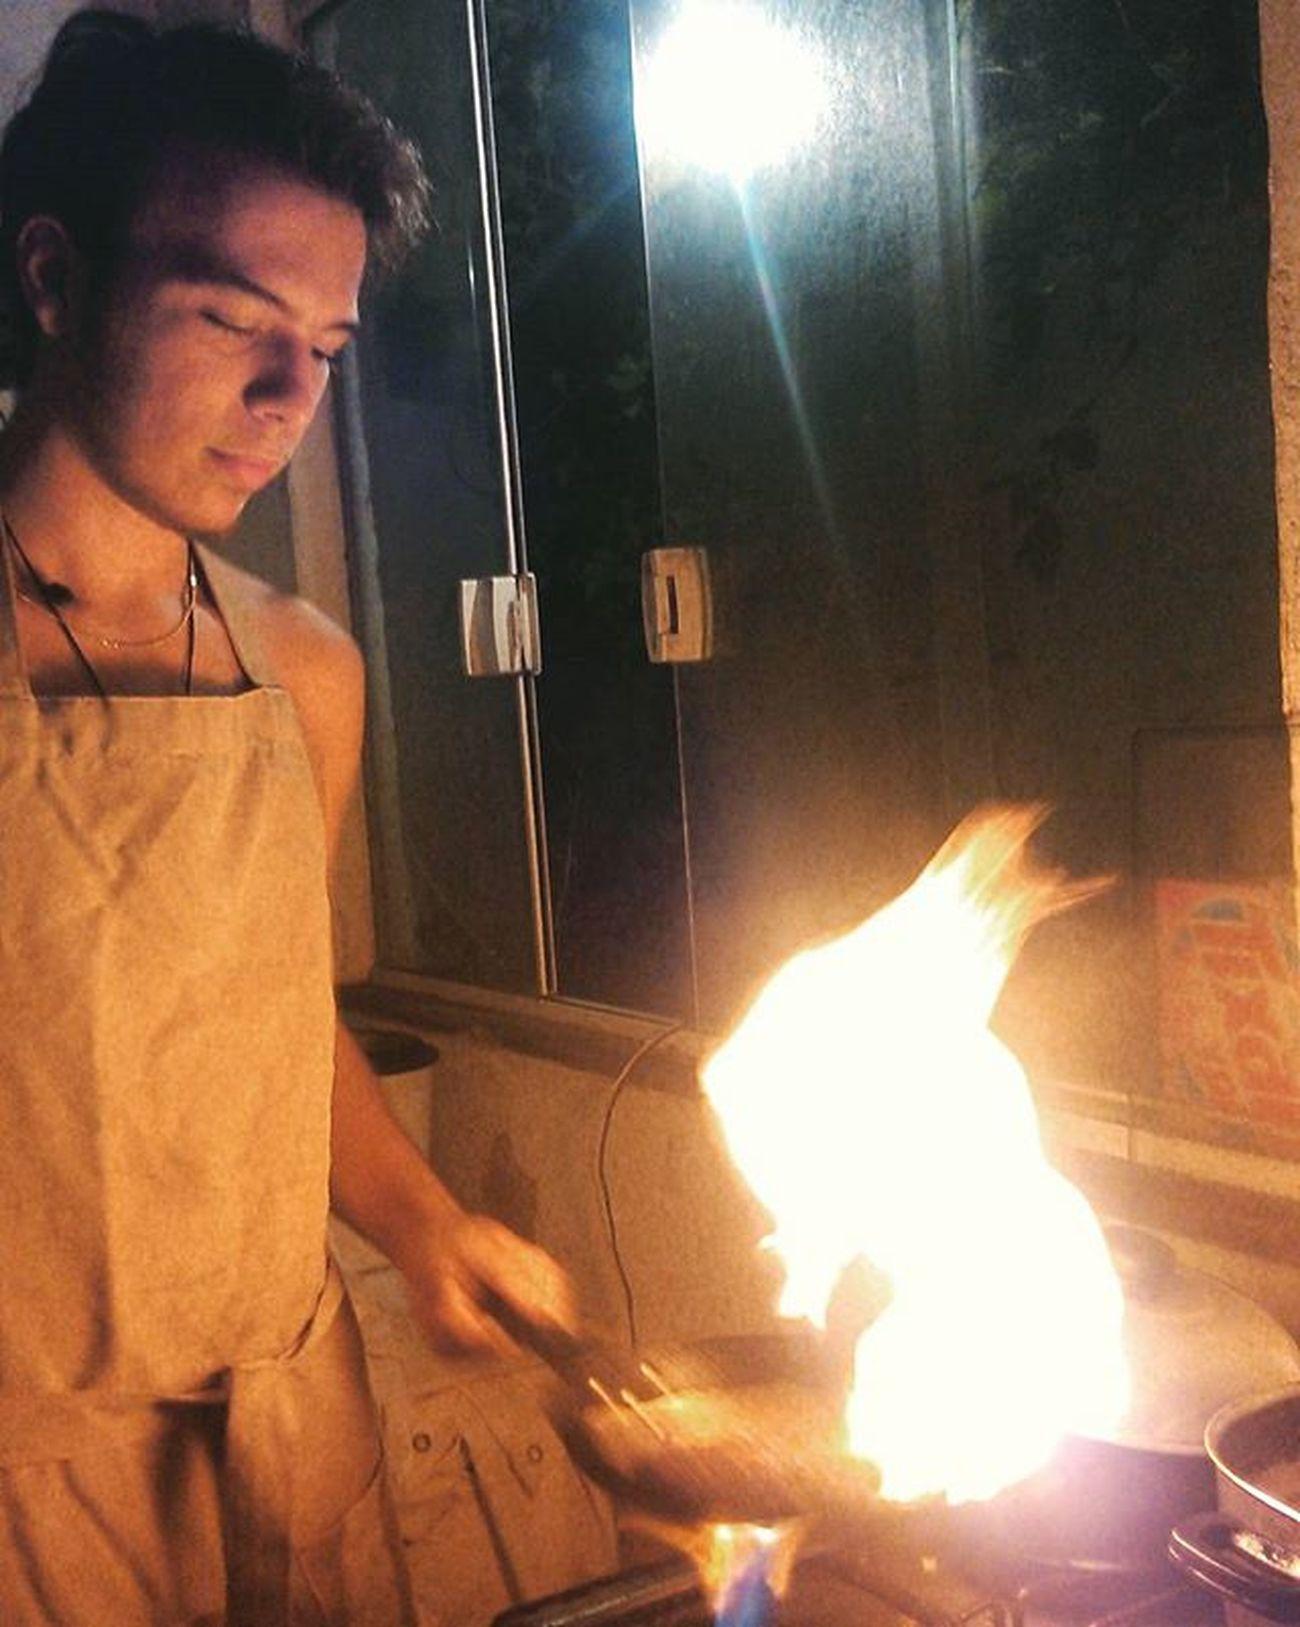 Brincadeira em casa. Cocinero Cozinheiro Chef Mylife Yococinero Buzios Buziosrj RJ Rj40graus Errejota  Riodejaneiro Bichdontkillmyvibe Brasil Brazil